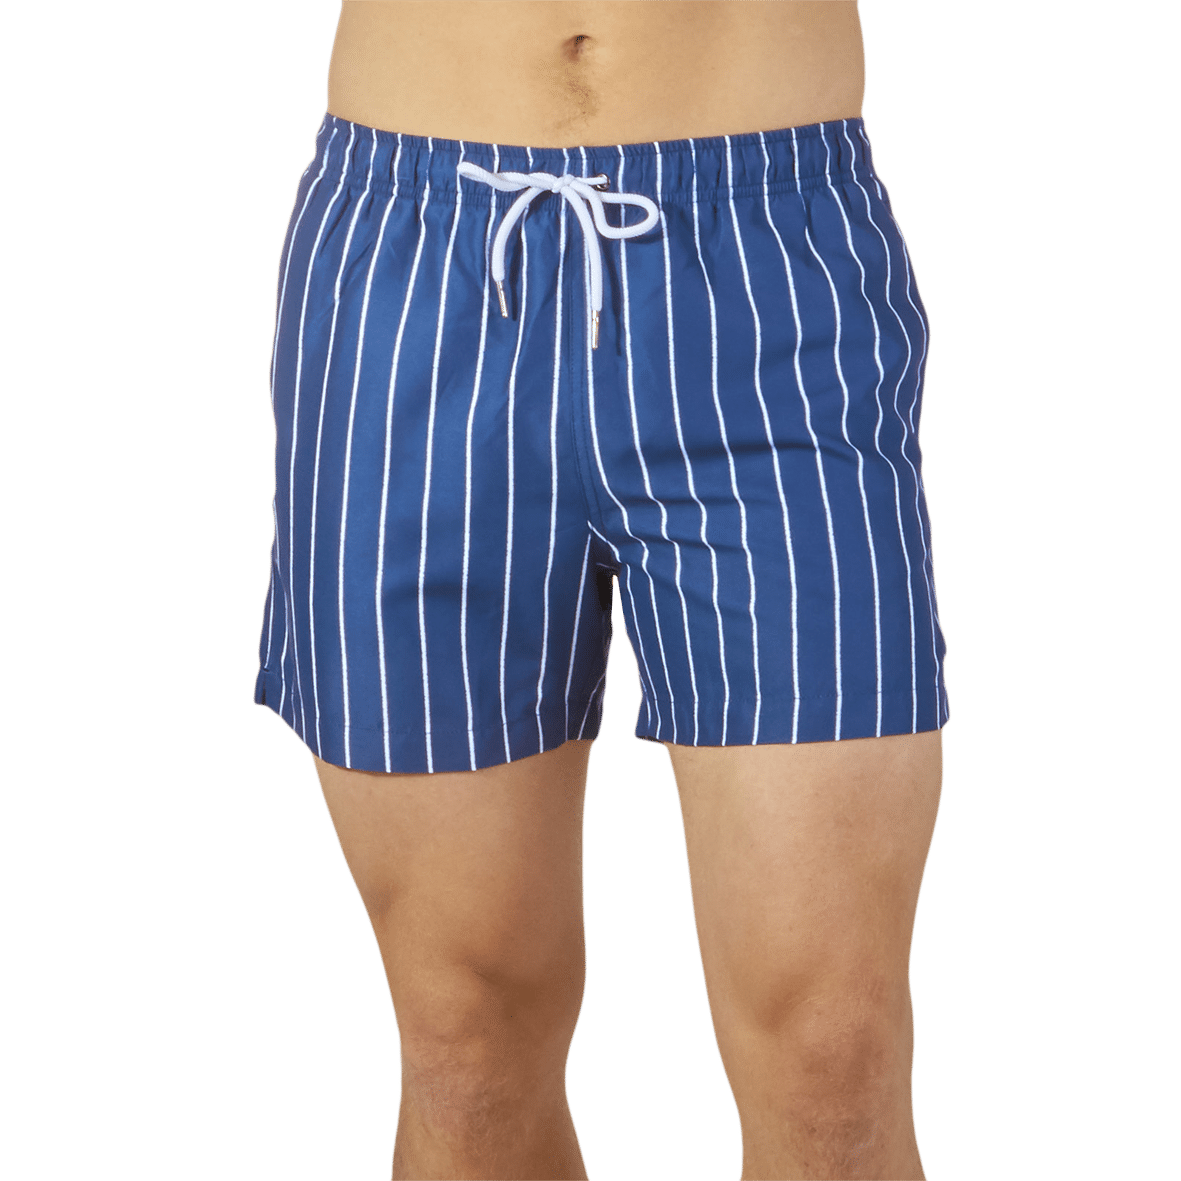 494fc82036c5 Suit Up Weird - Blue Pinstripe Daiquiri Swim Shorts | Baltzar